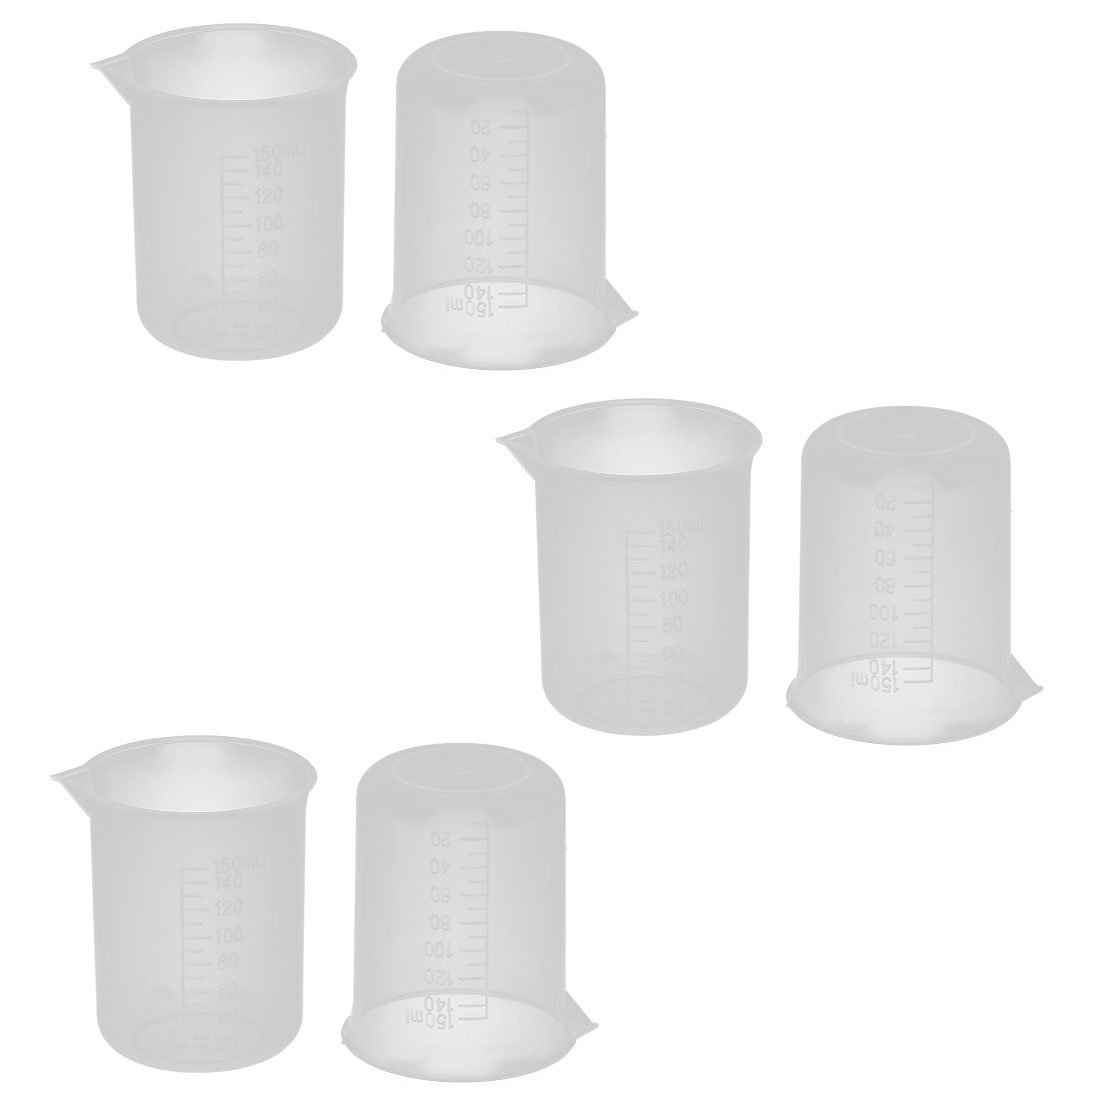 sourcingmap® Plastic Science Laboratory Water Liquid Measuring Cup Beaker 150ml 6 Pcs US-SA-AJD-173409